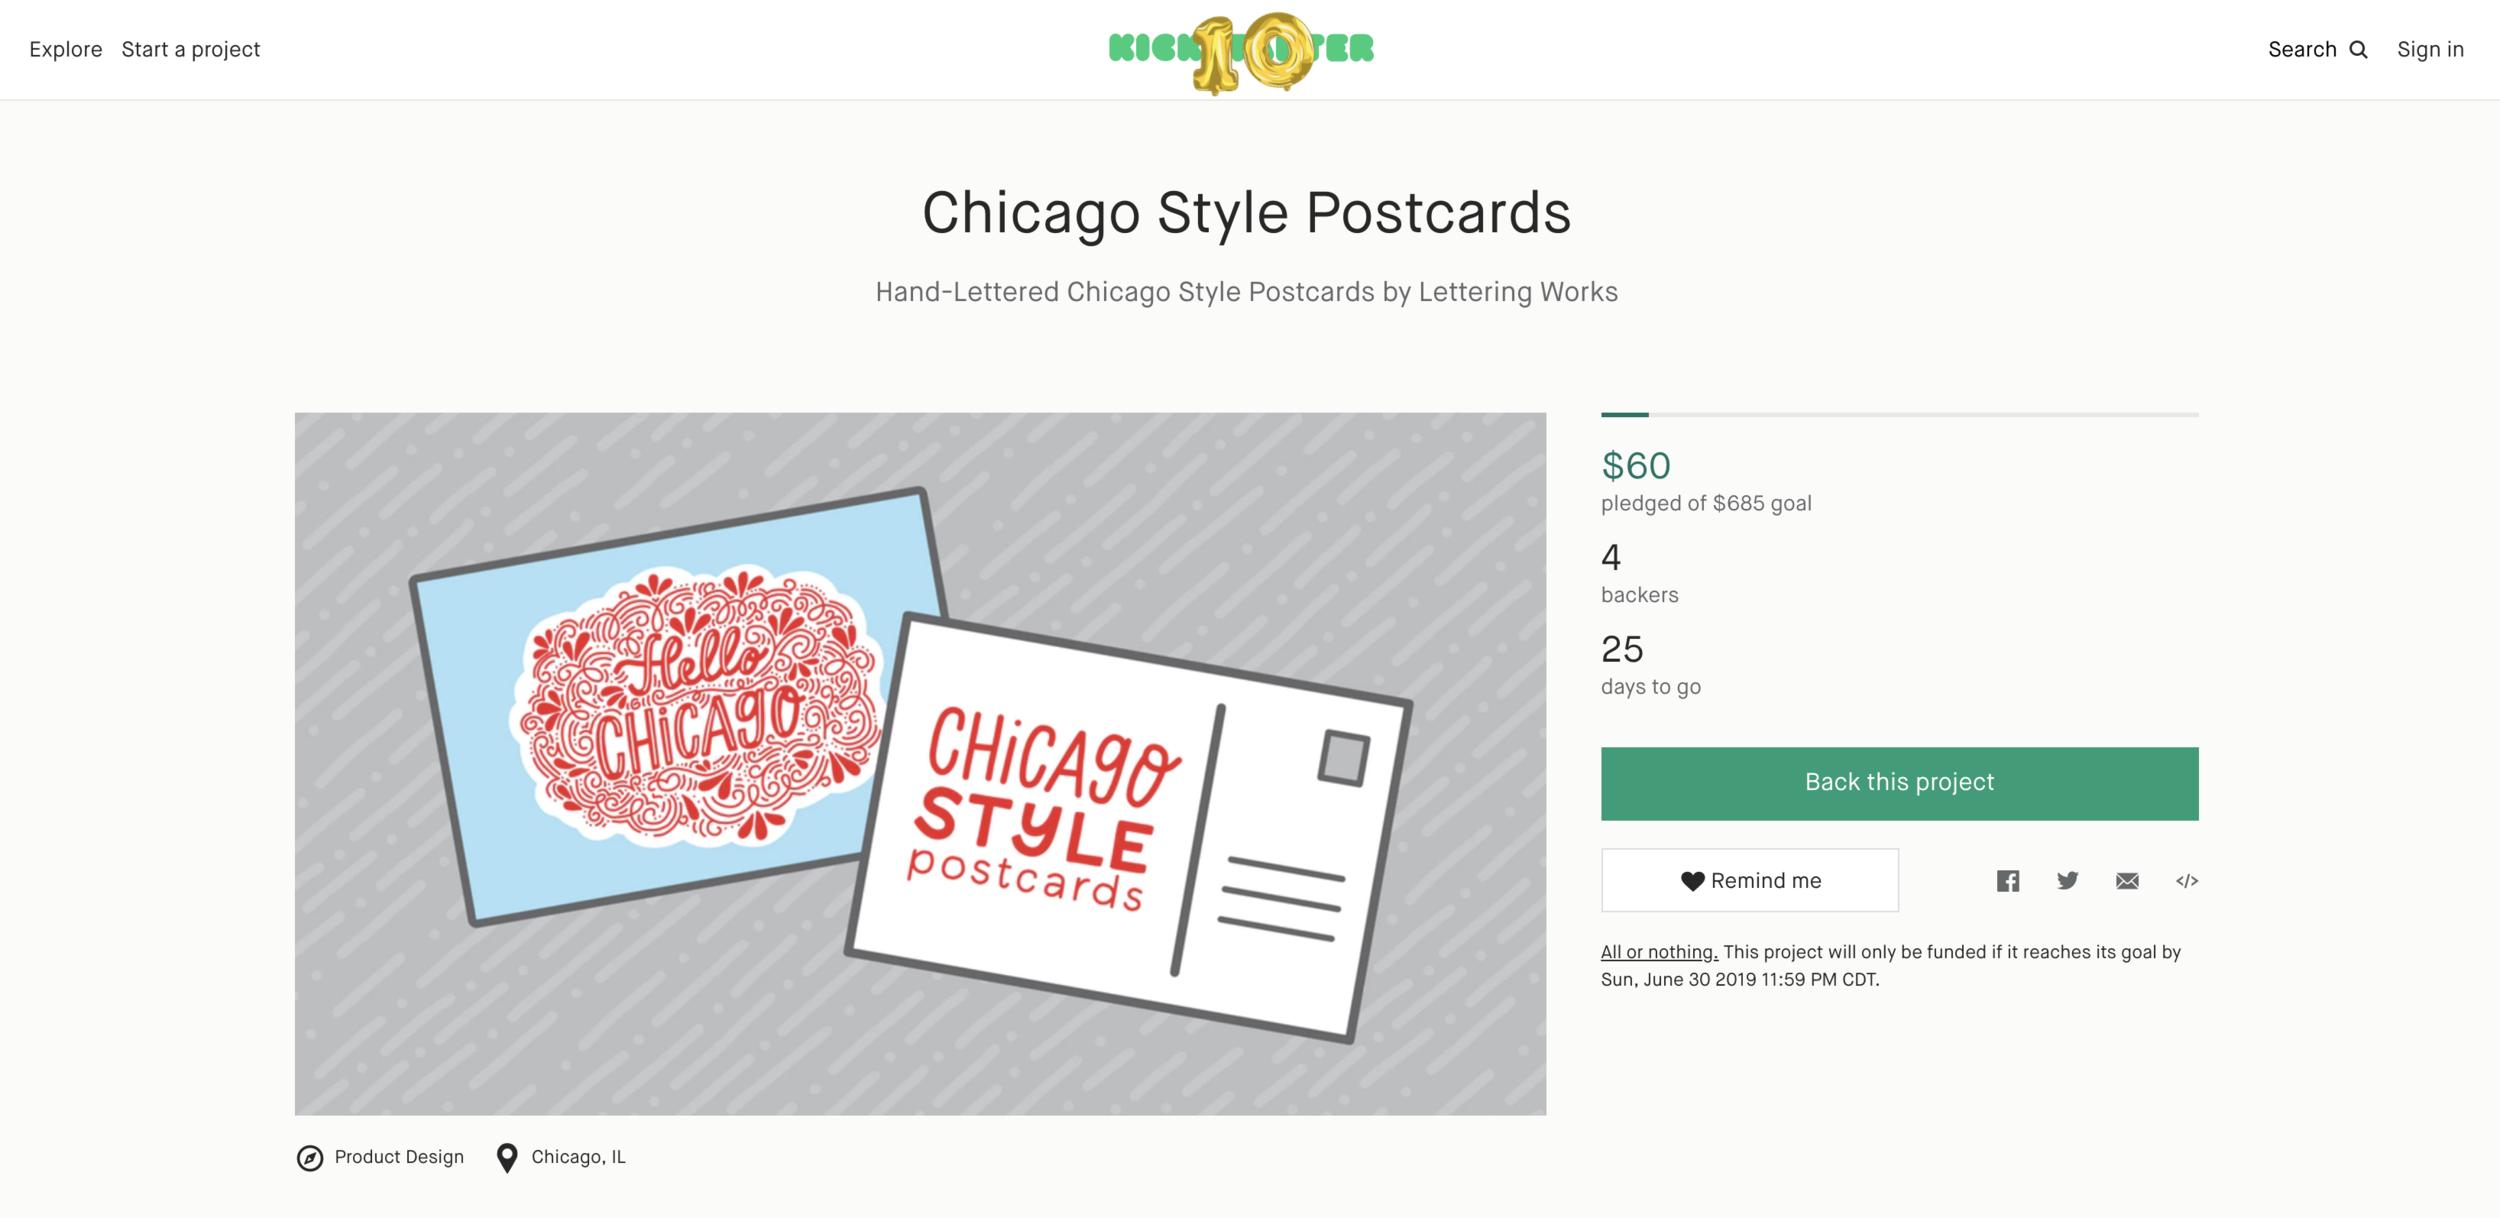 Chicago Style Postcards - Kickstarter